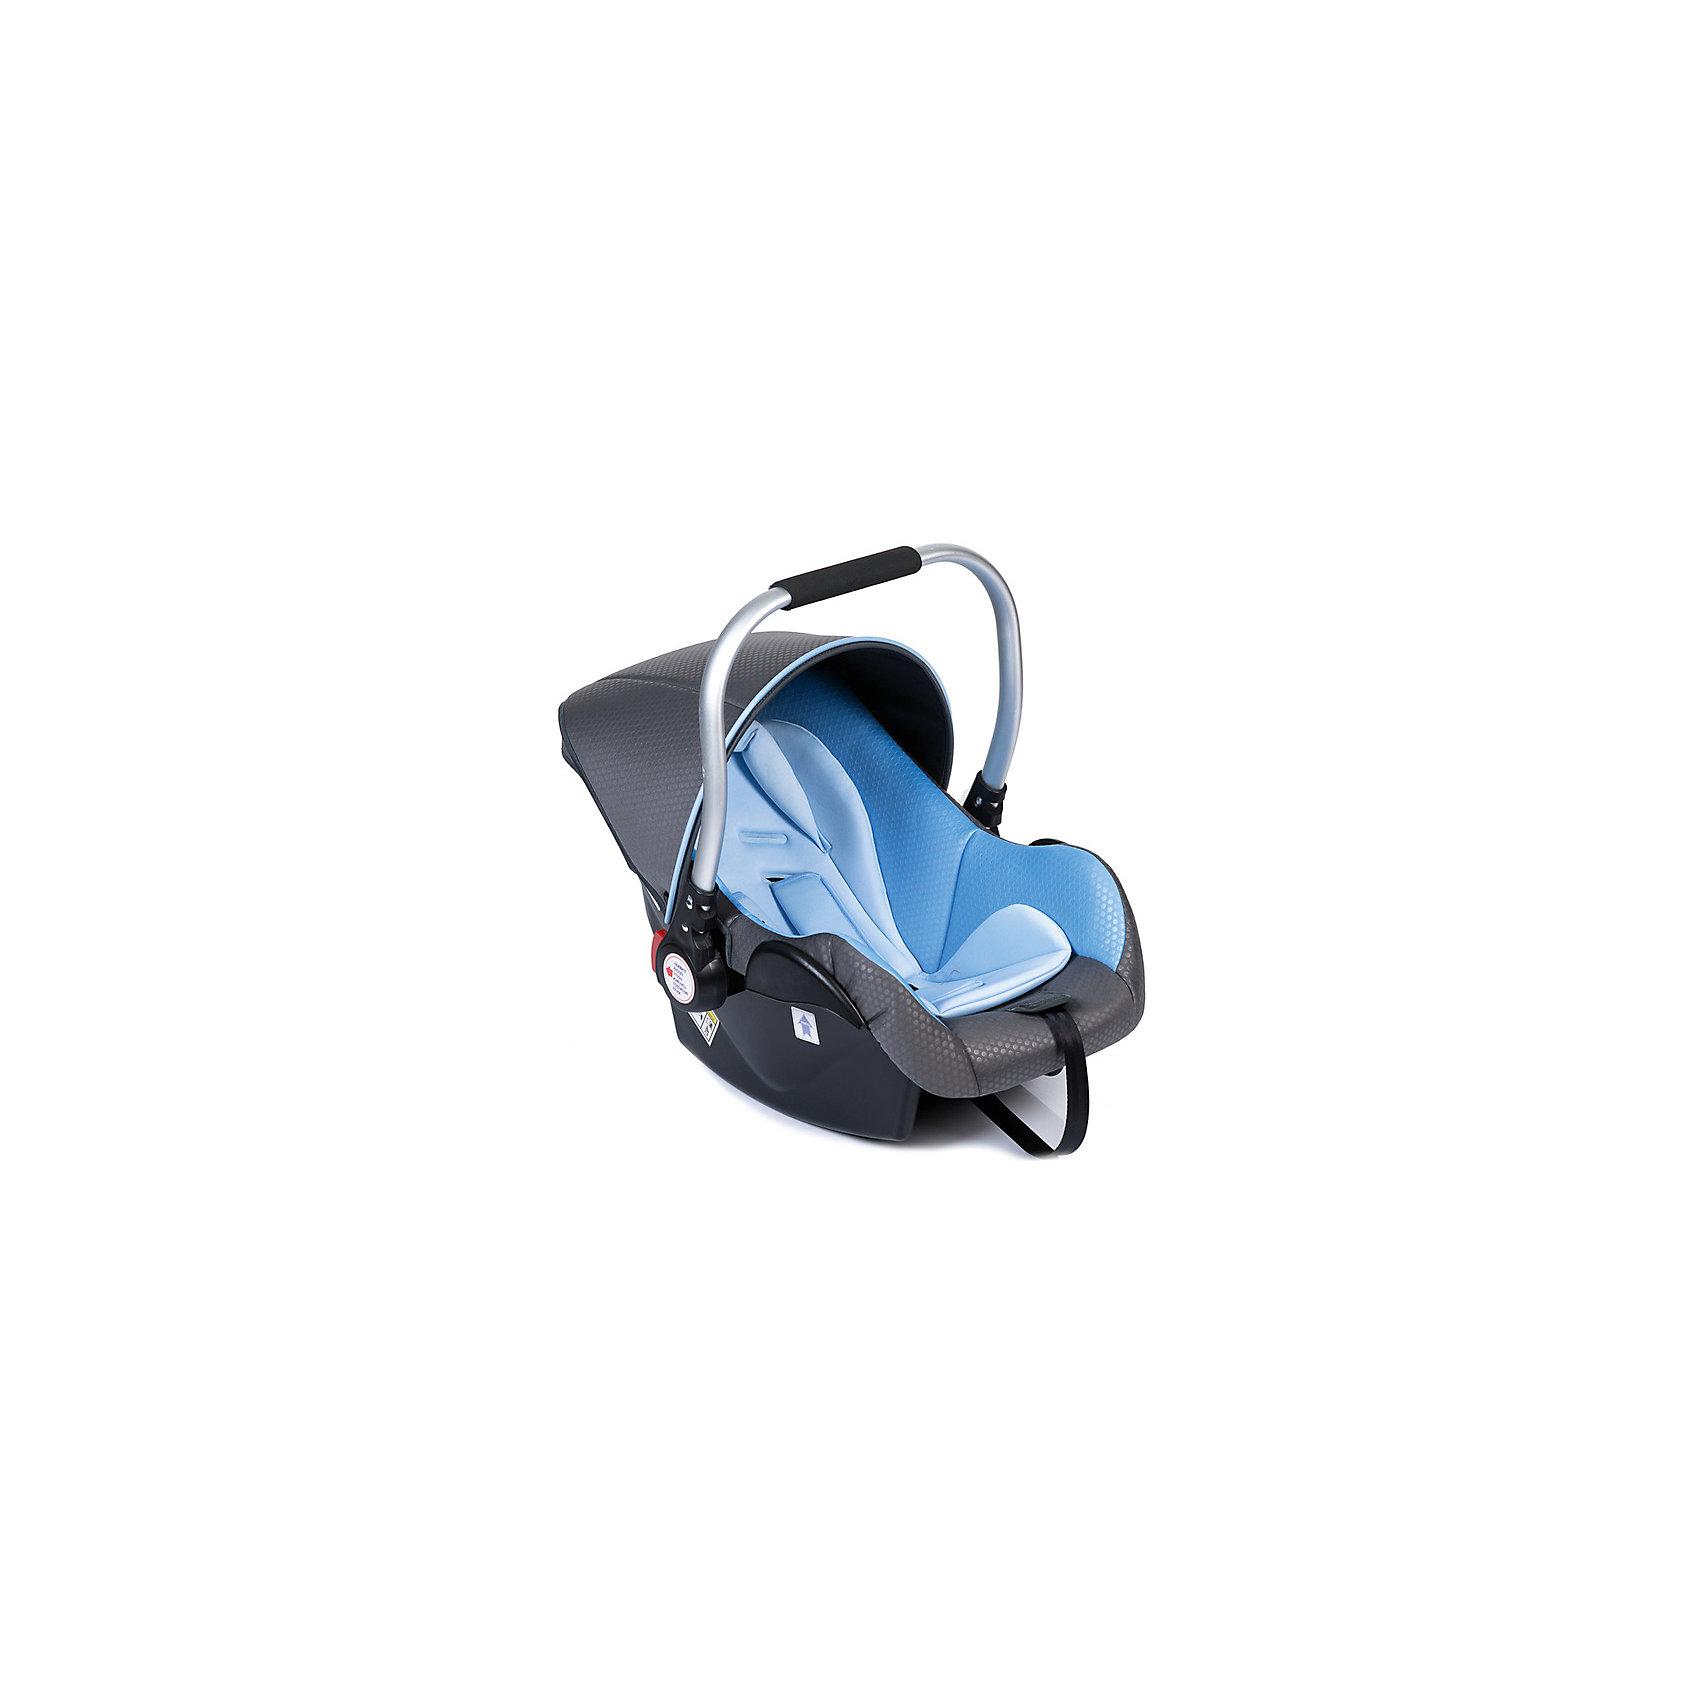 Автокресло PRIMARY, 0-13 кг., Babyhit, синий/серый